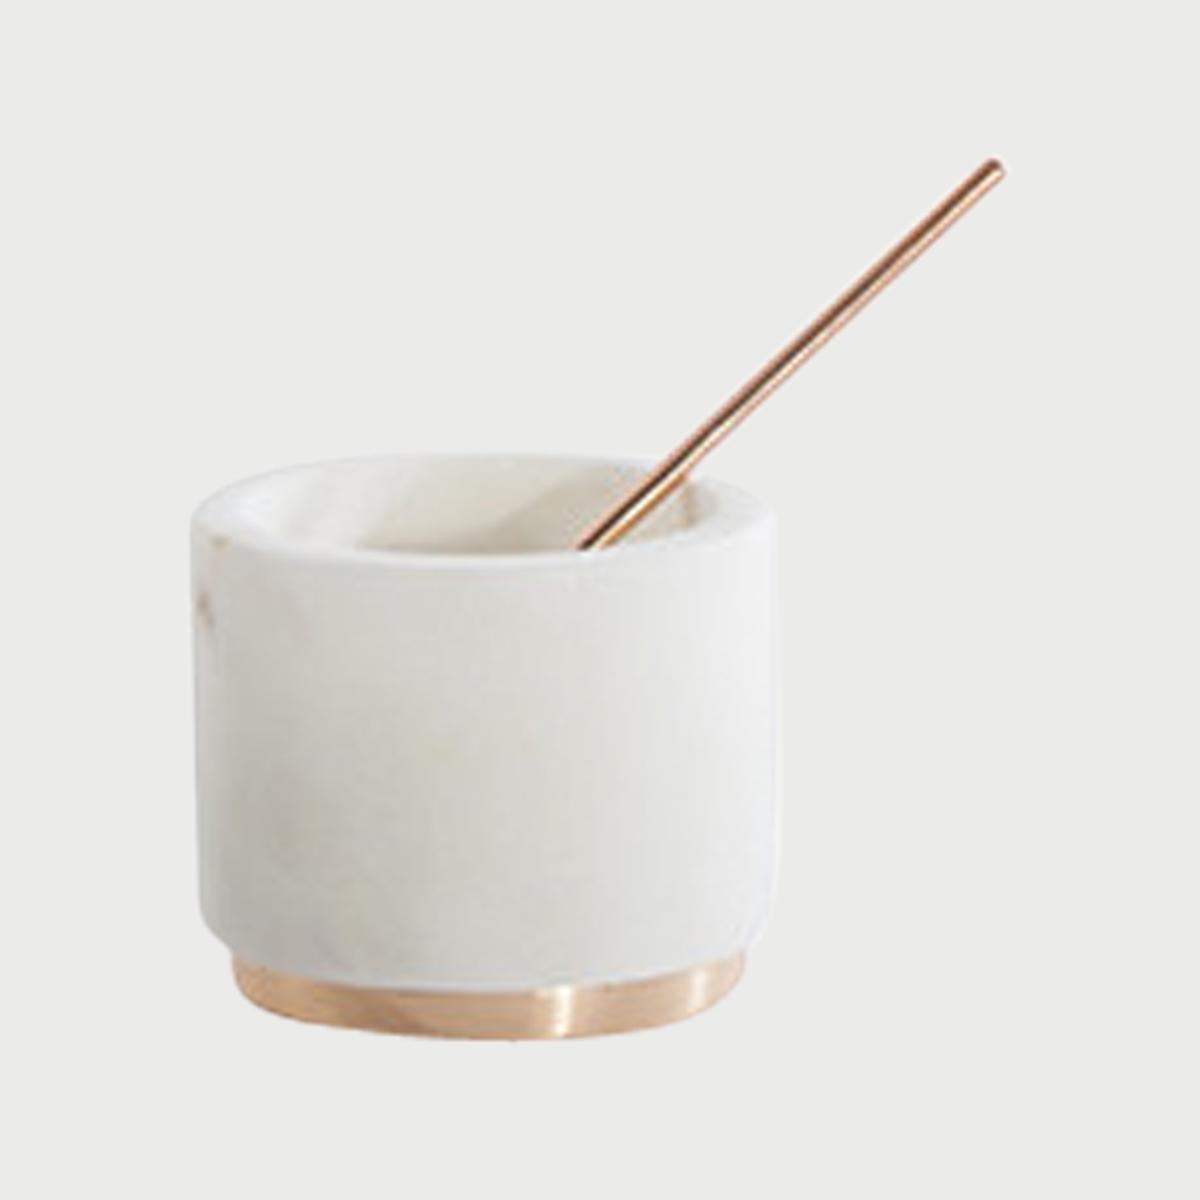 Mara copper sugar pinch pot spoon in